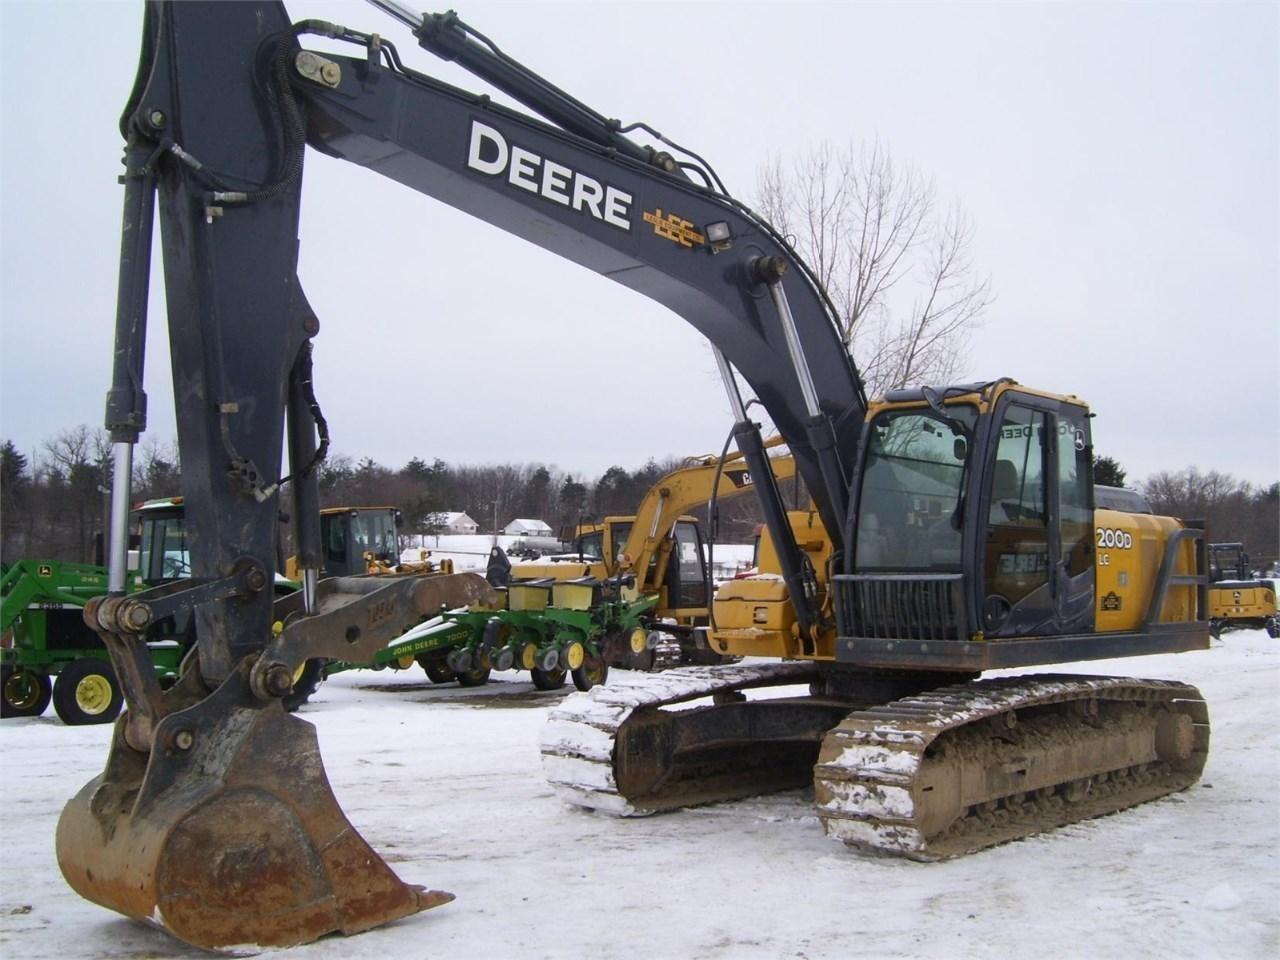 2011 John Deere 200d Lc, Lapeer MI - 111670776 ...